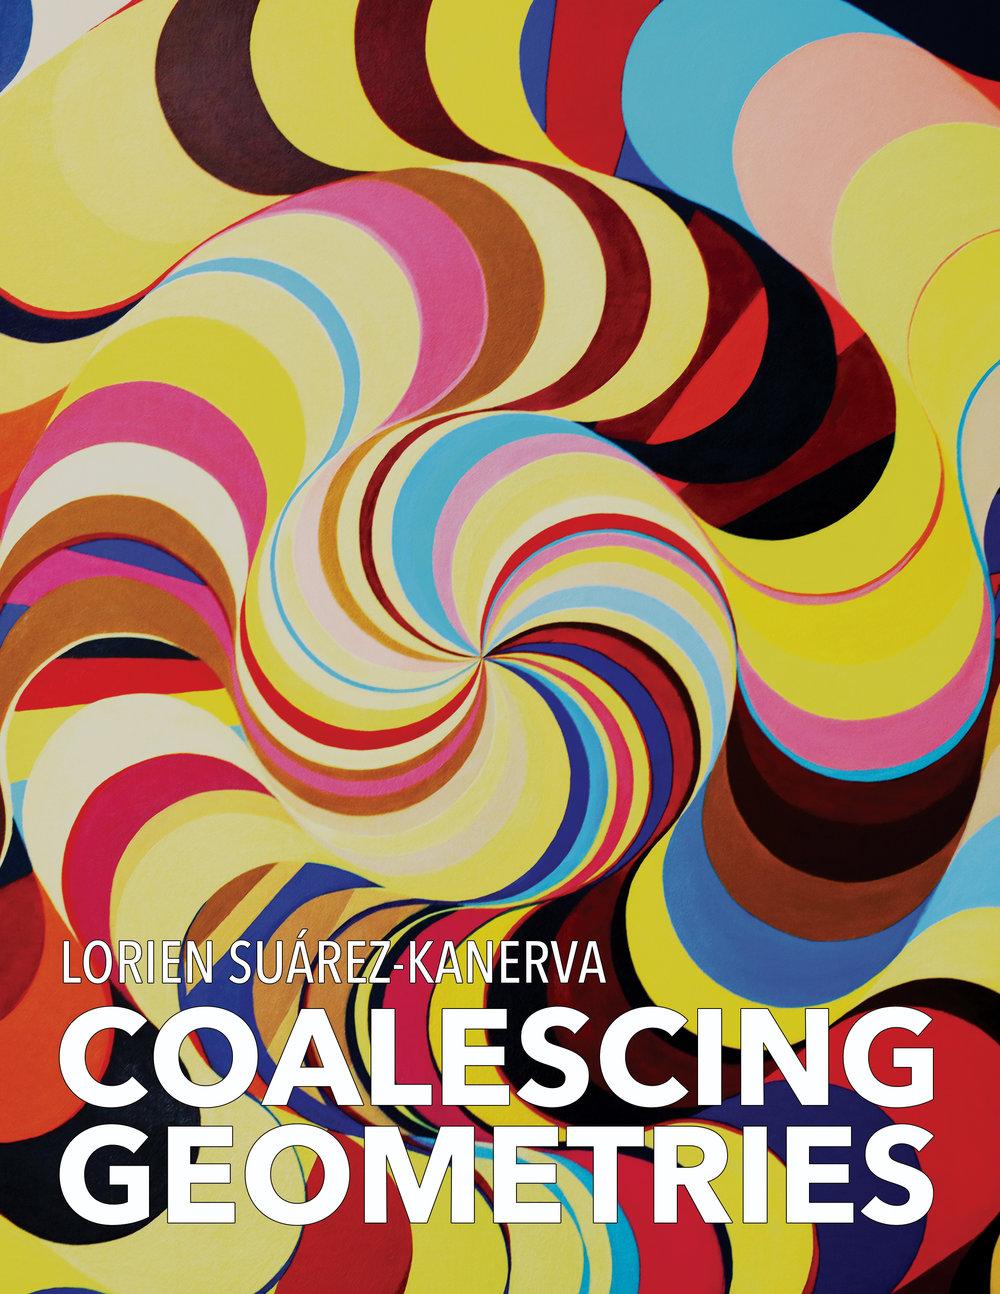 12.Lorien Suarez-Kanerva cover.jpg